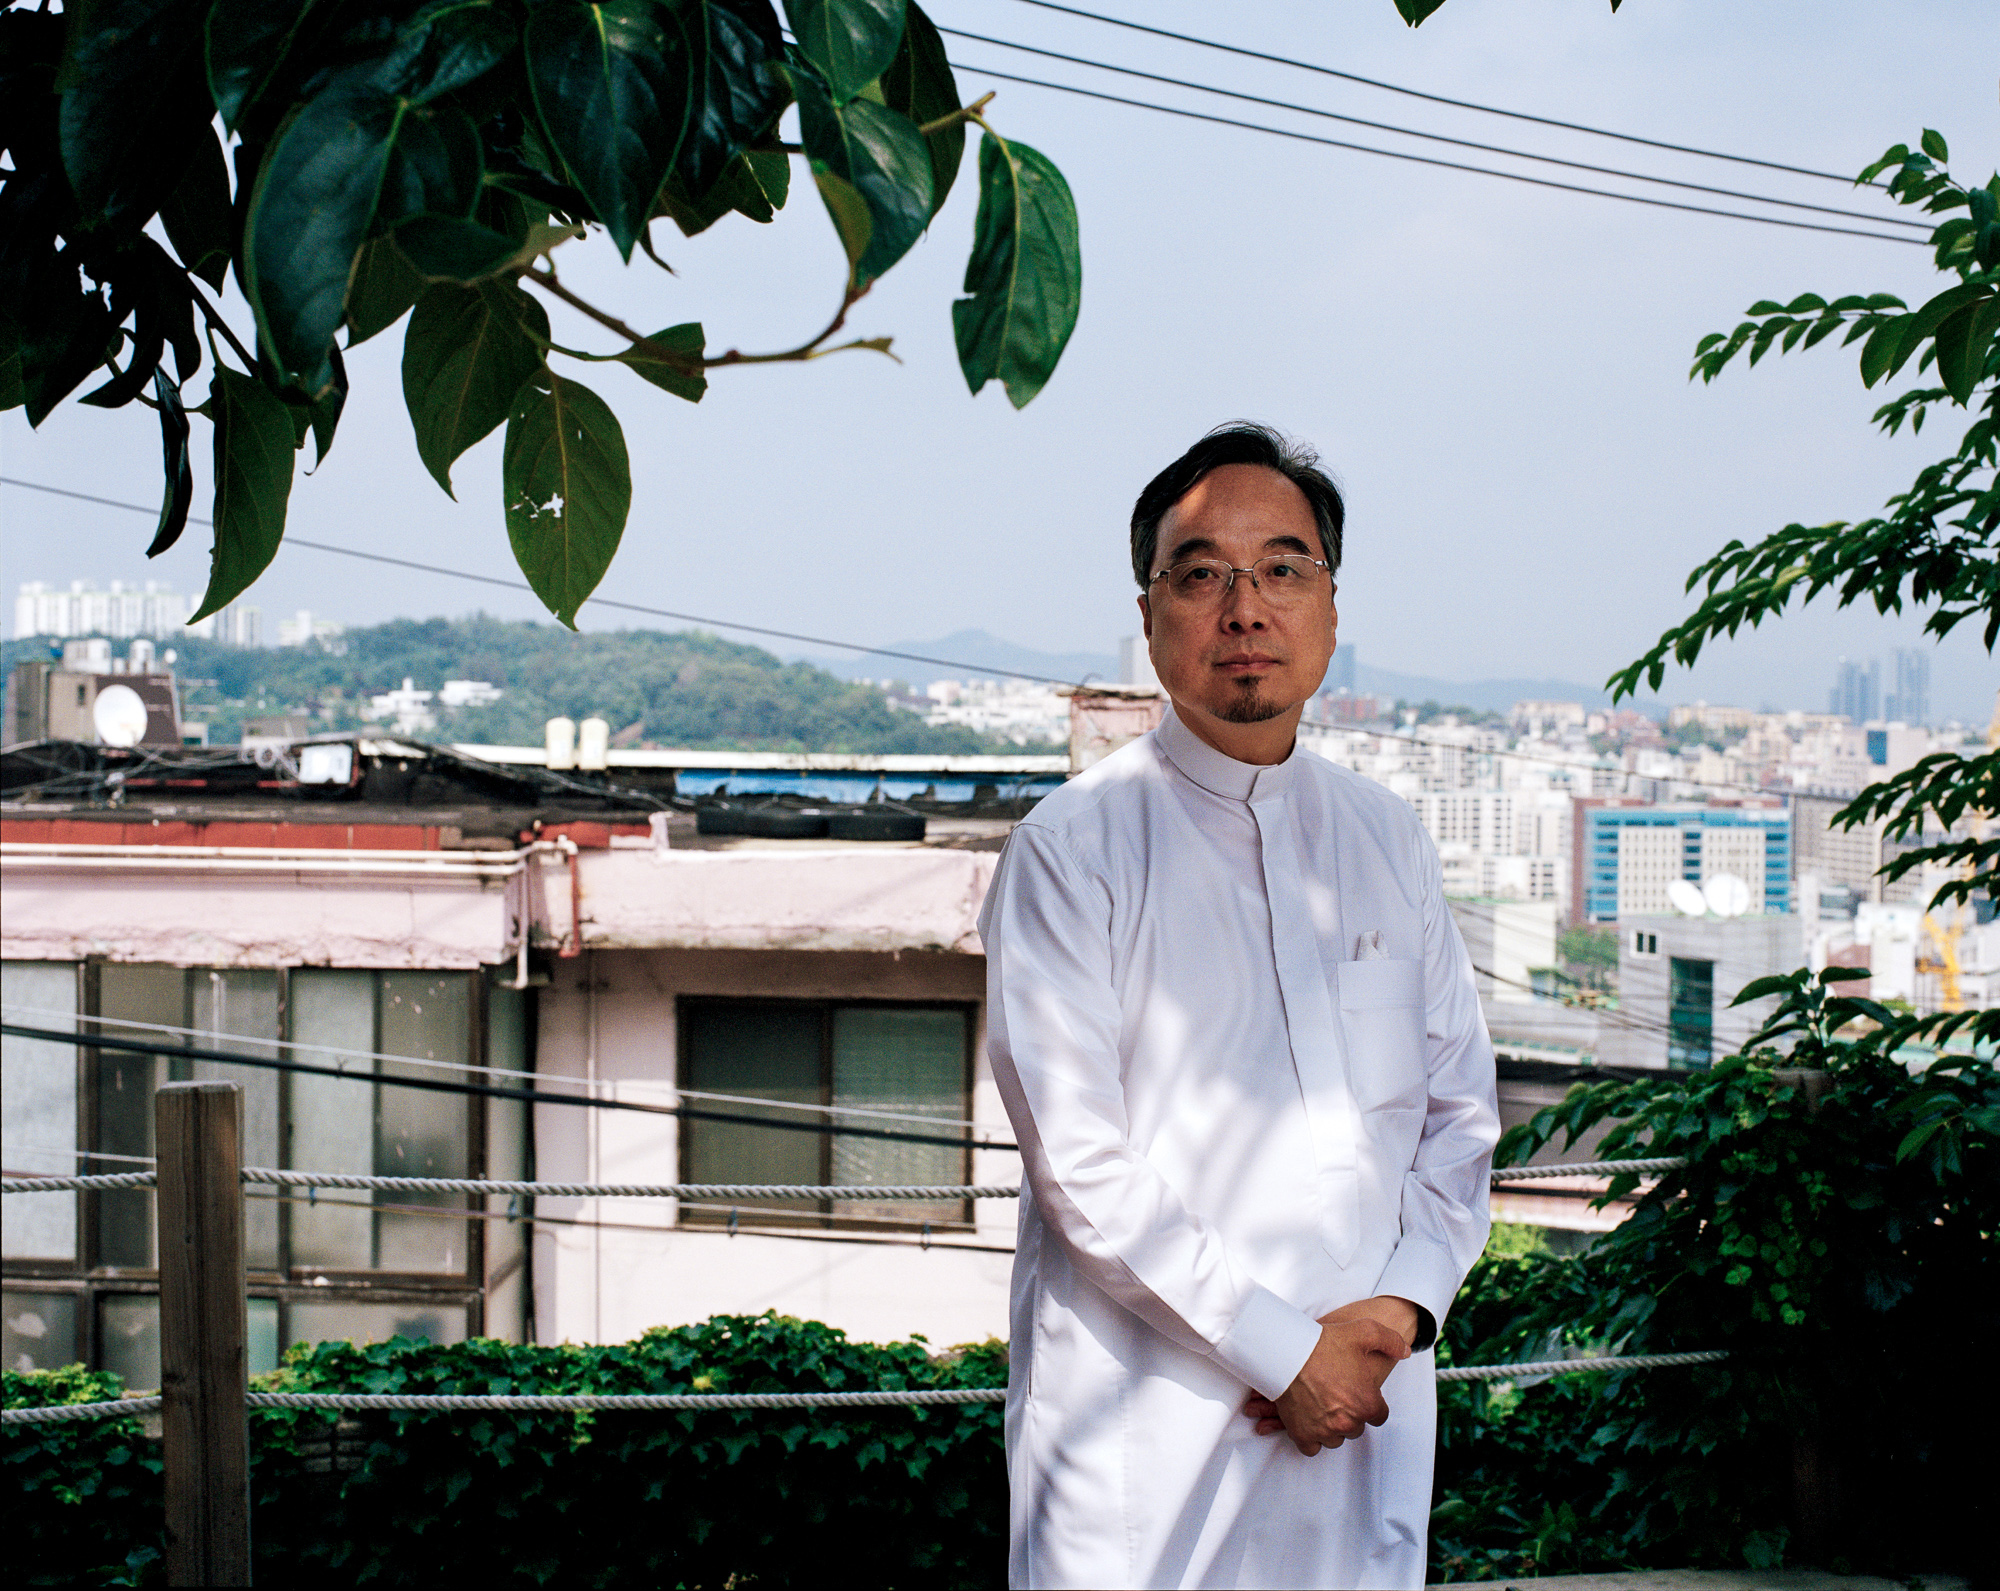 RaduDiaconu_South Korean Muslims_Imam Lee.jpg